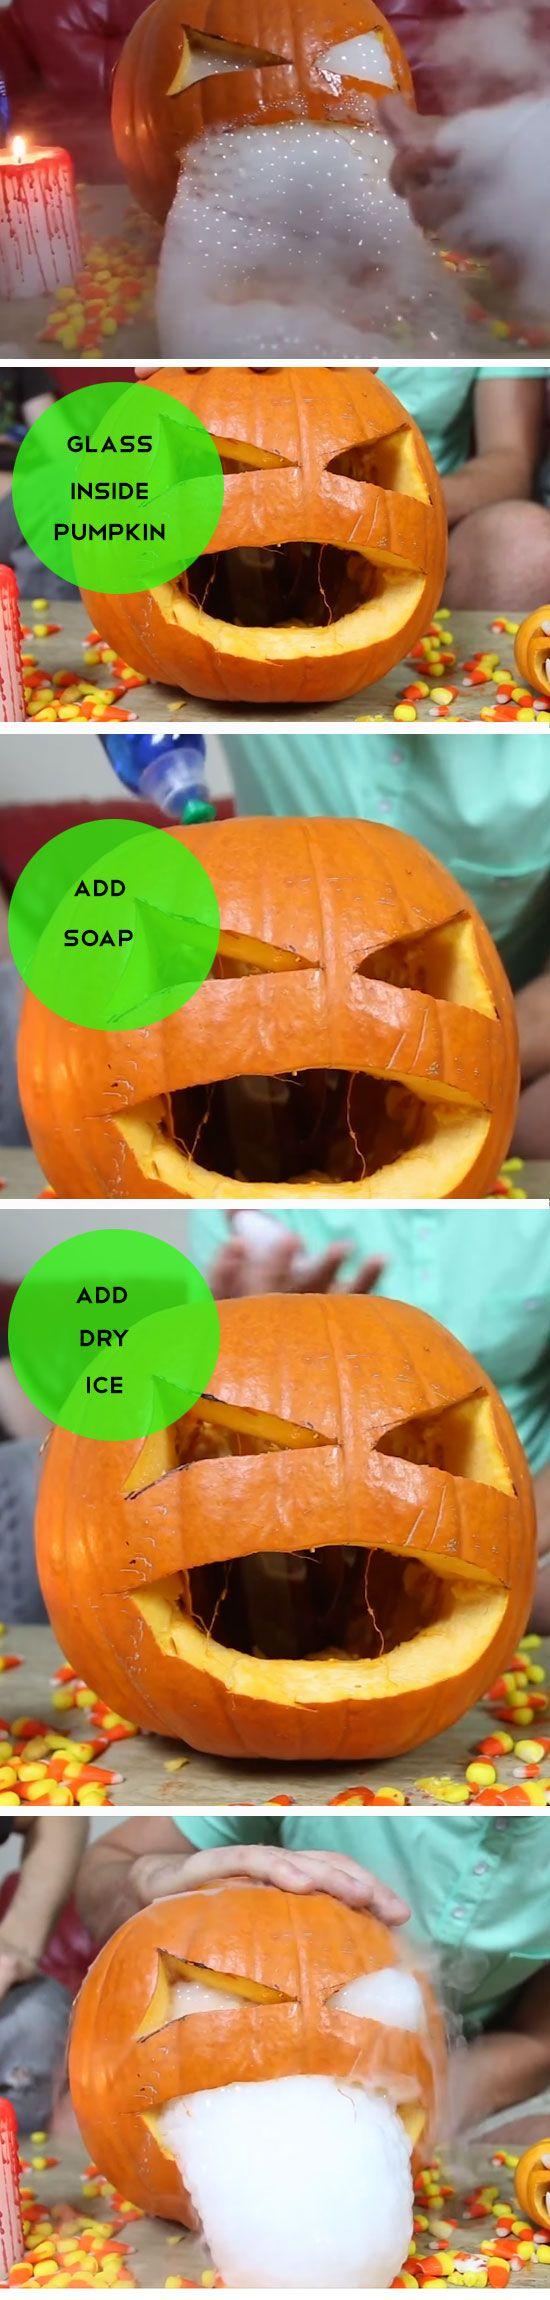 best 25 puking pumpkin ideas on pinterest halloween food ideas 2016 halloween food for party. Black Bedroom Furniture Sets. Home Design Ideas